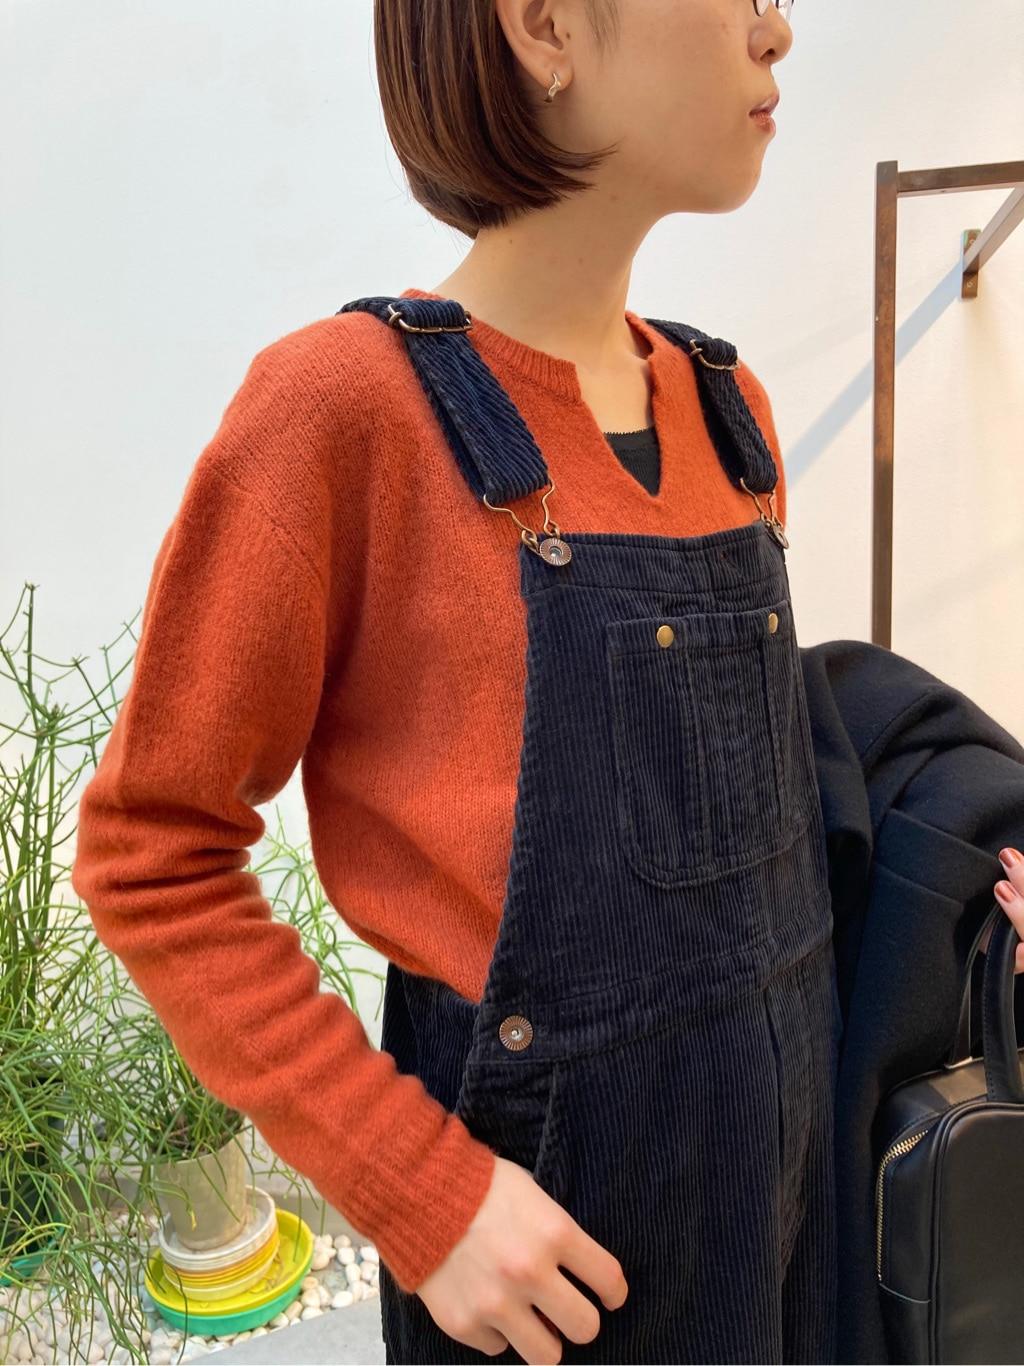 l'atelier du savon 名古屋栄路面 身長:161cm 2020.11.10